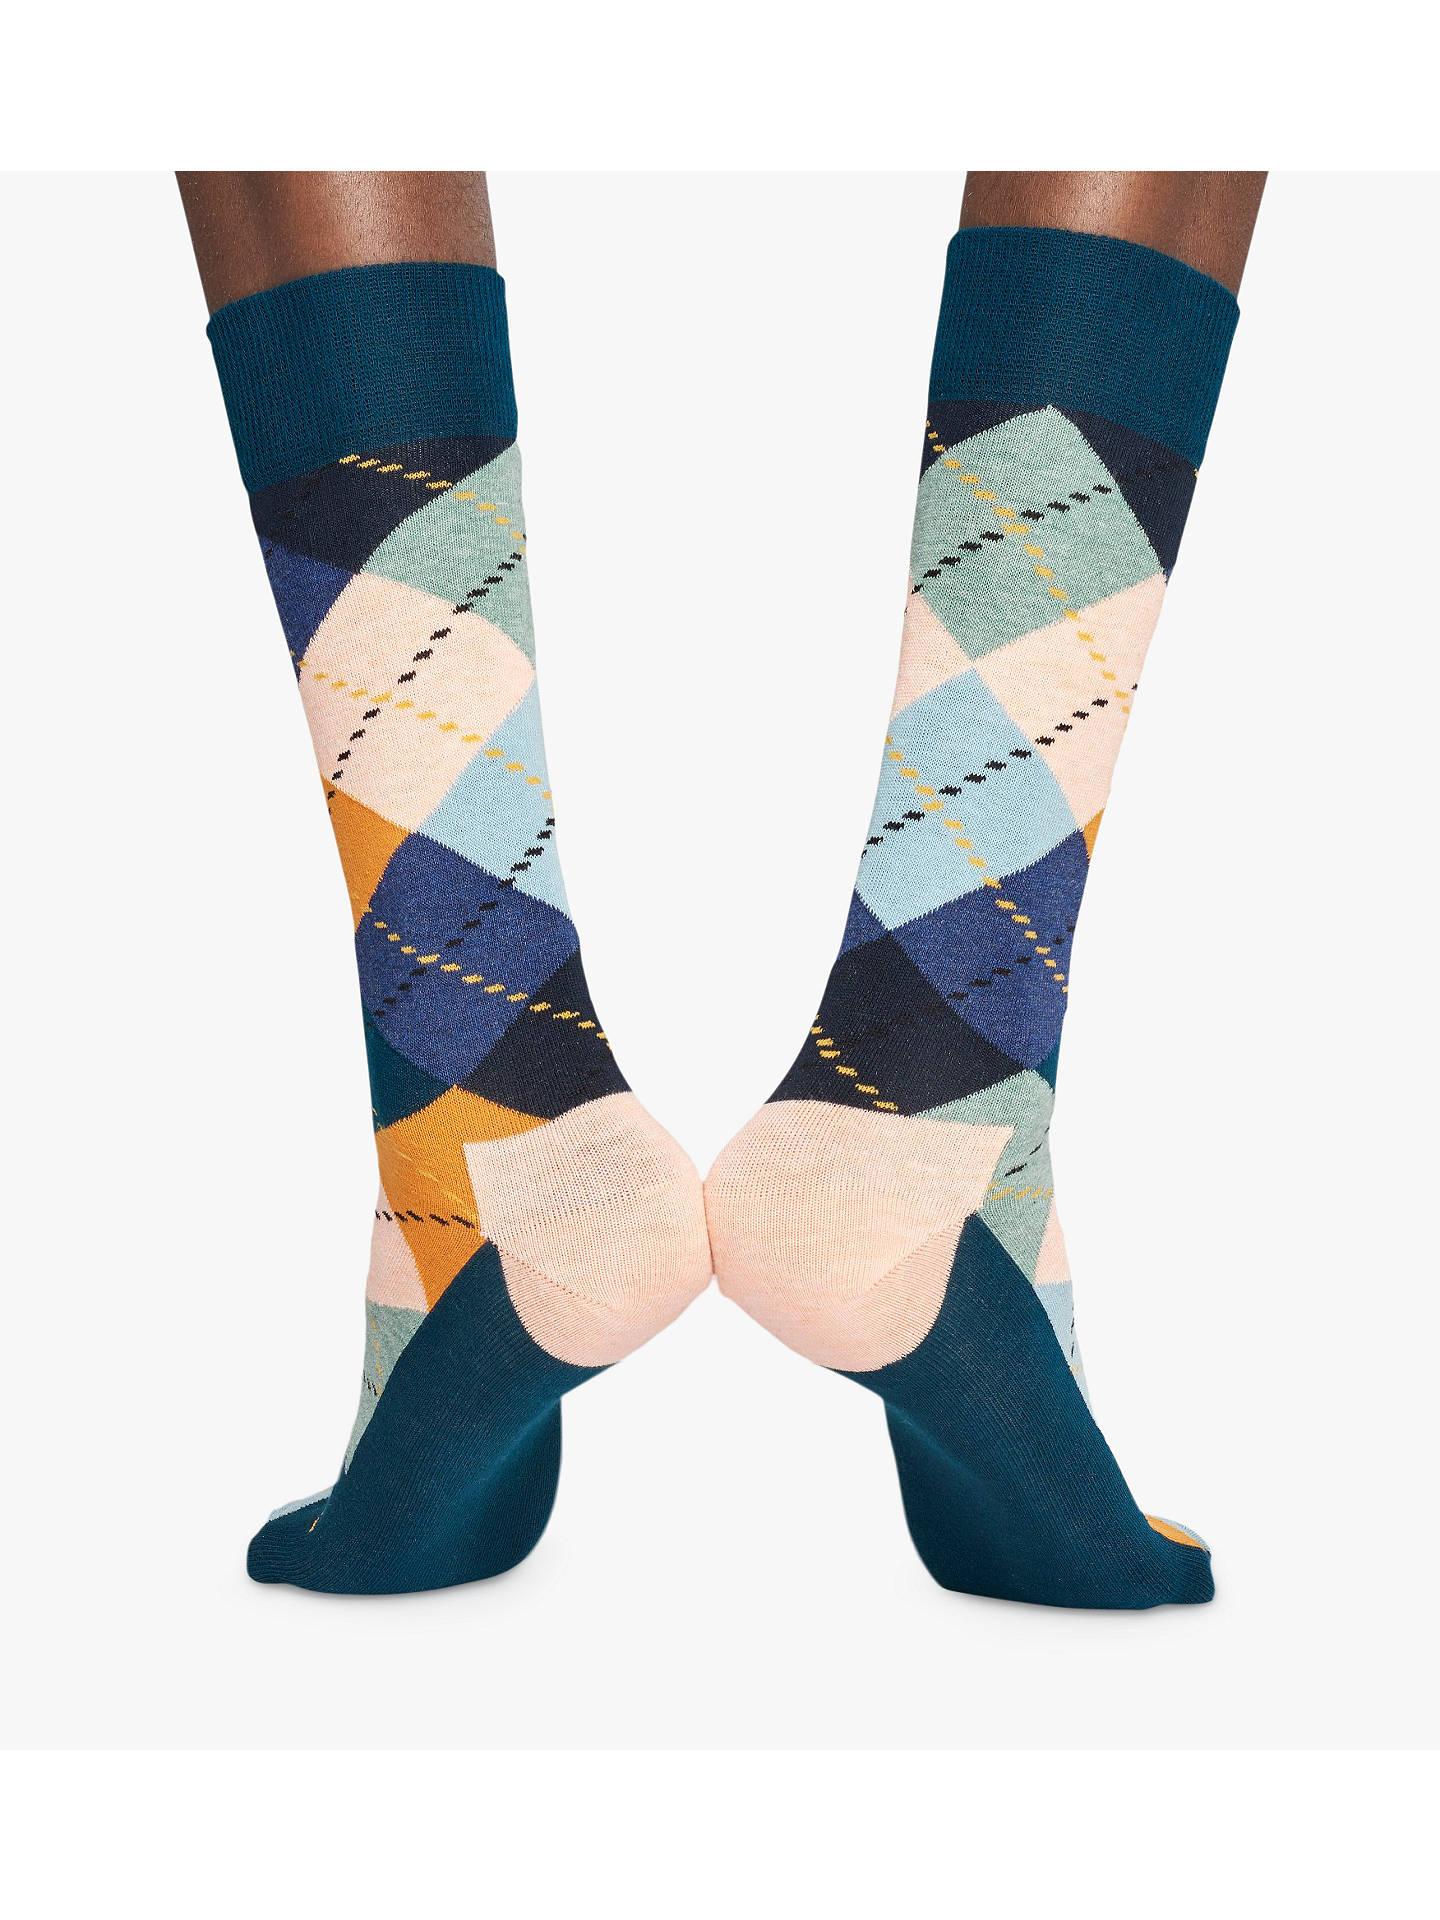 fadc0022e4e61 Buy Happy Socks Argyle Socks, One Size, Pastel/Multi Online at johnlewis.